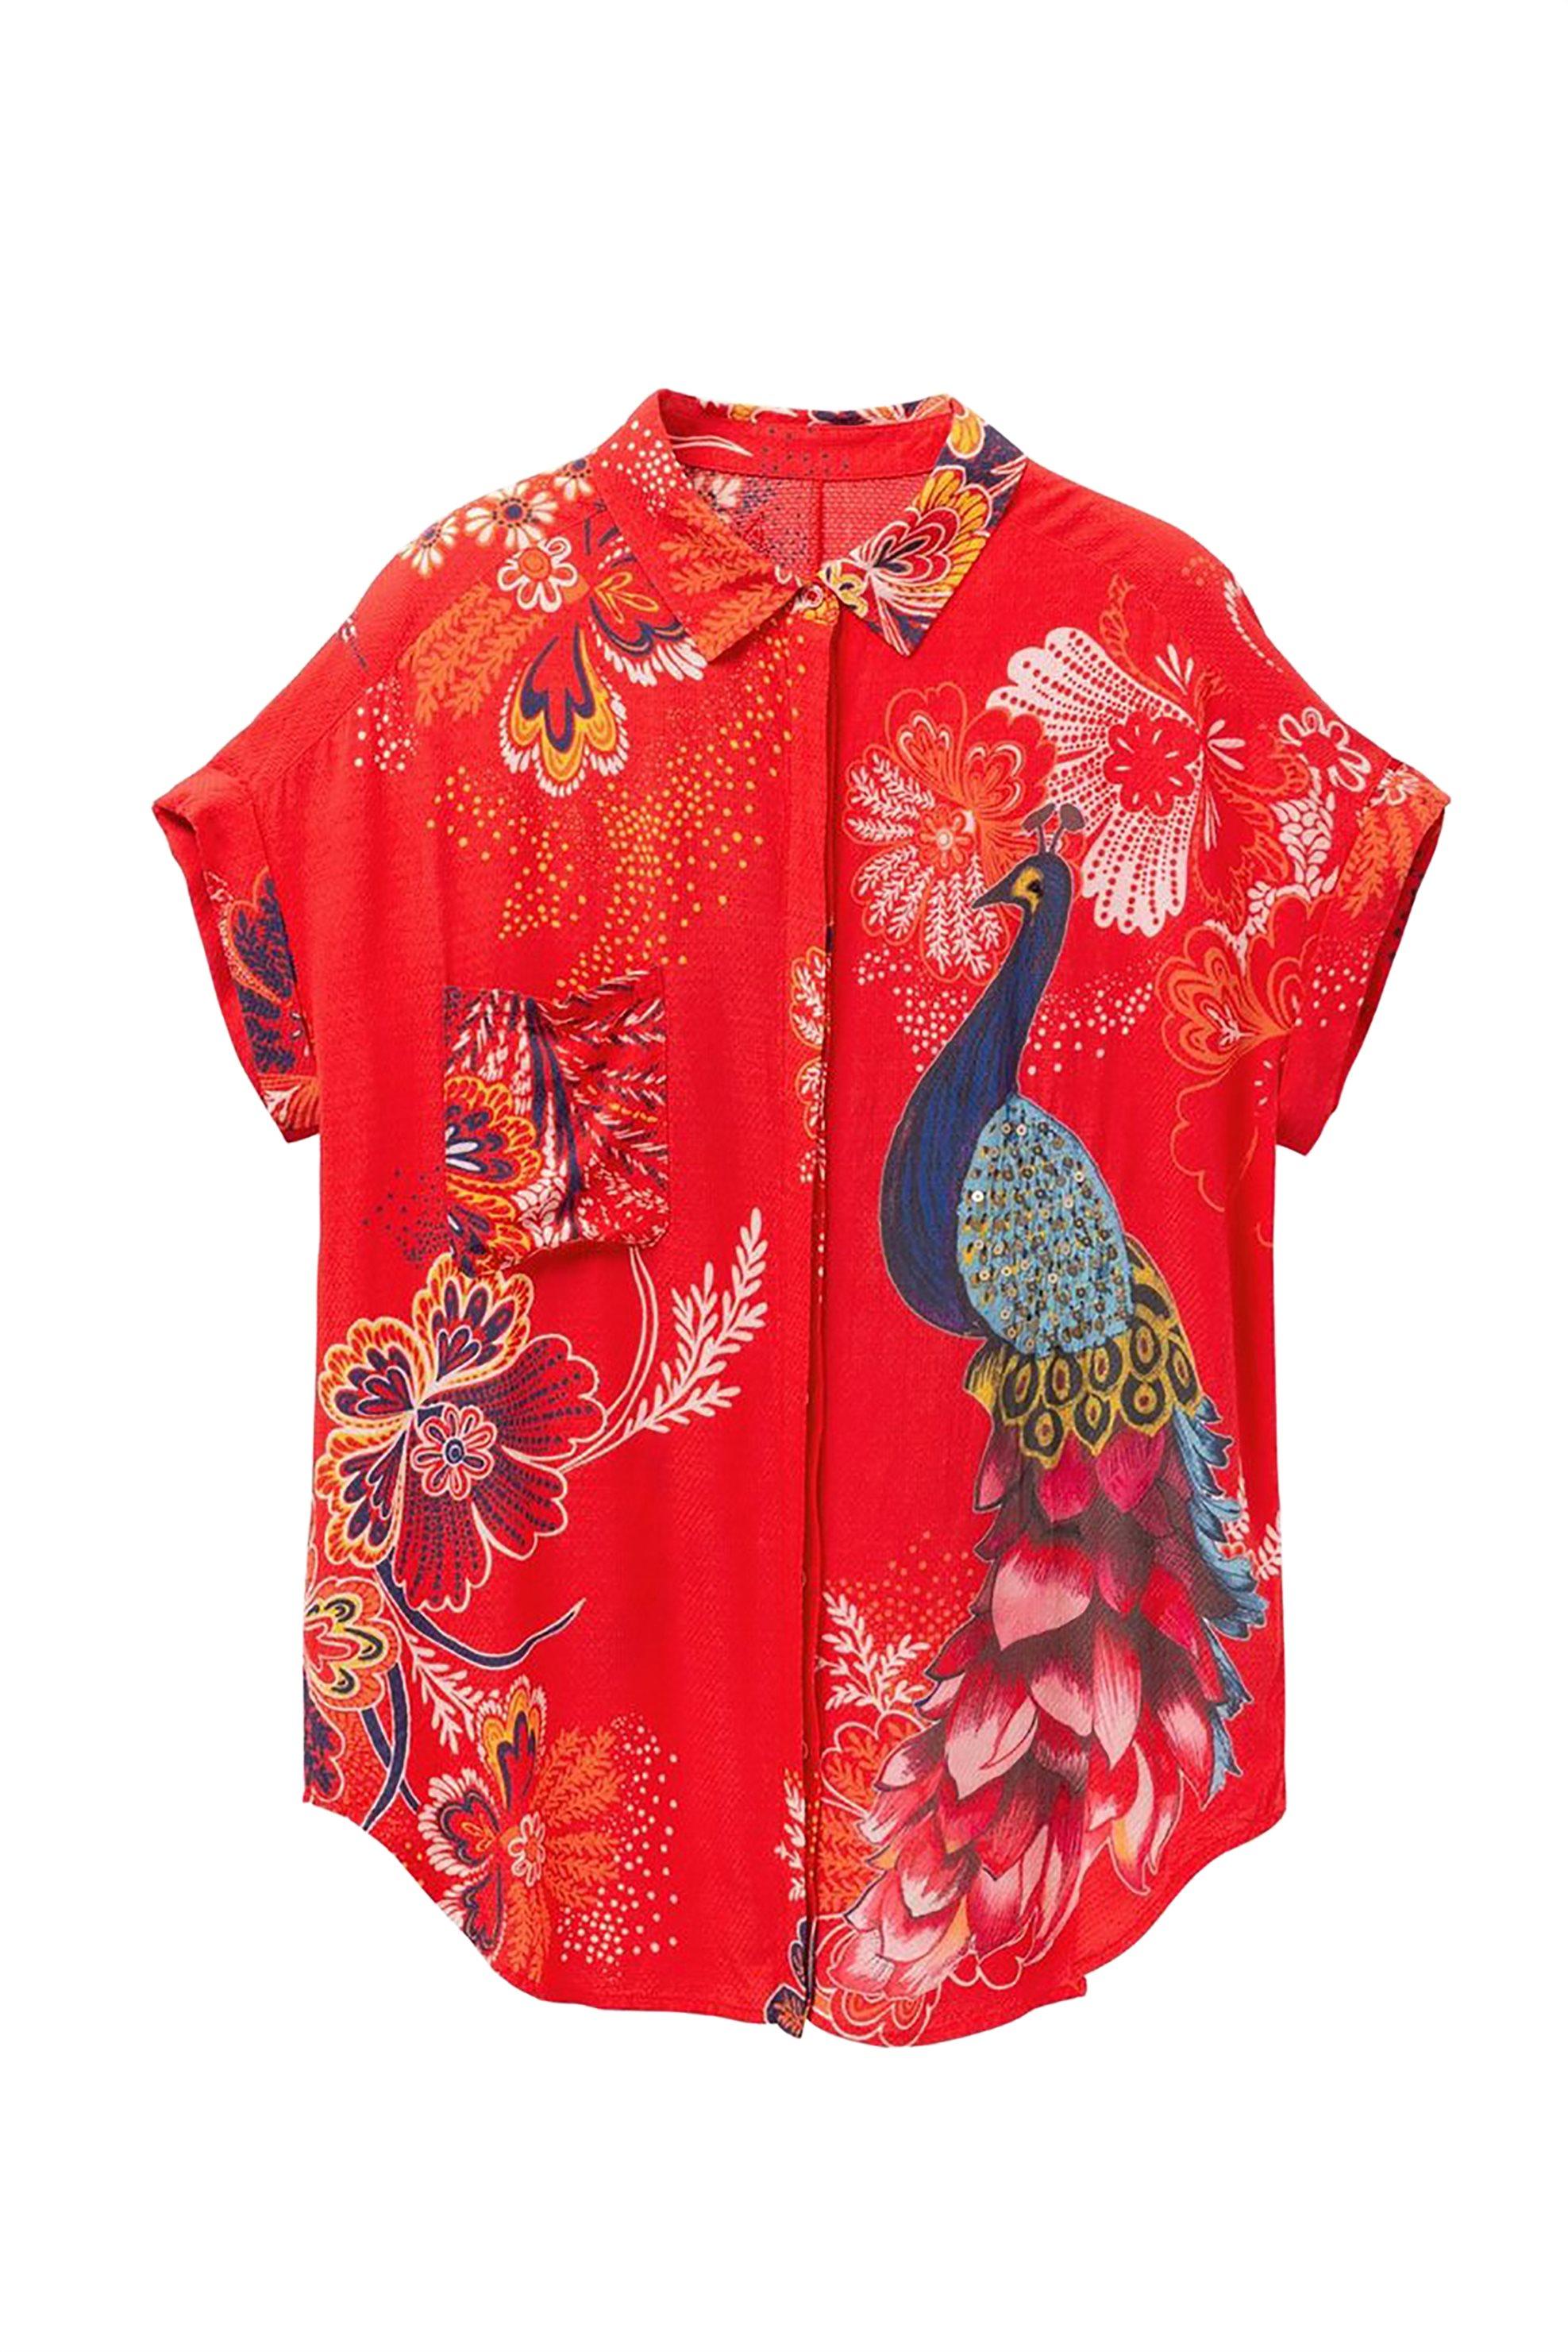 Desigual γυναικείο πουκάμισο με κοντό μανίκι Ιnaya - 19SWCW90 - Κόκκινο γυναικα   ρουχα   tops   πουκάμισα   casual